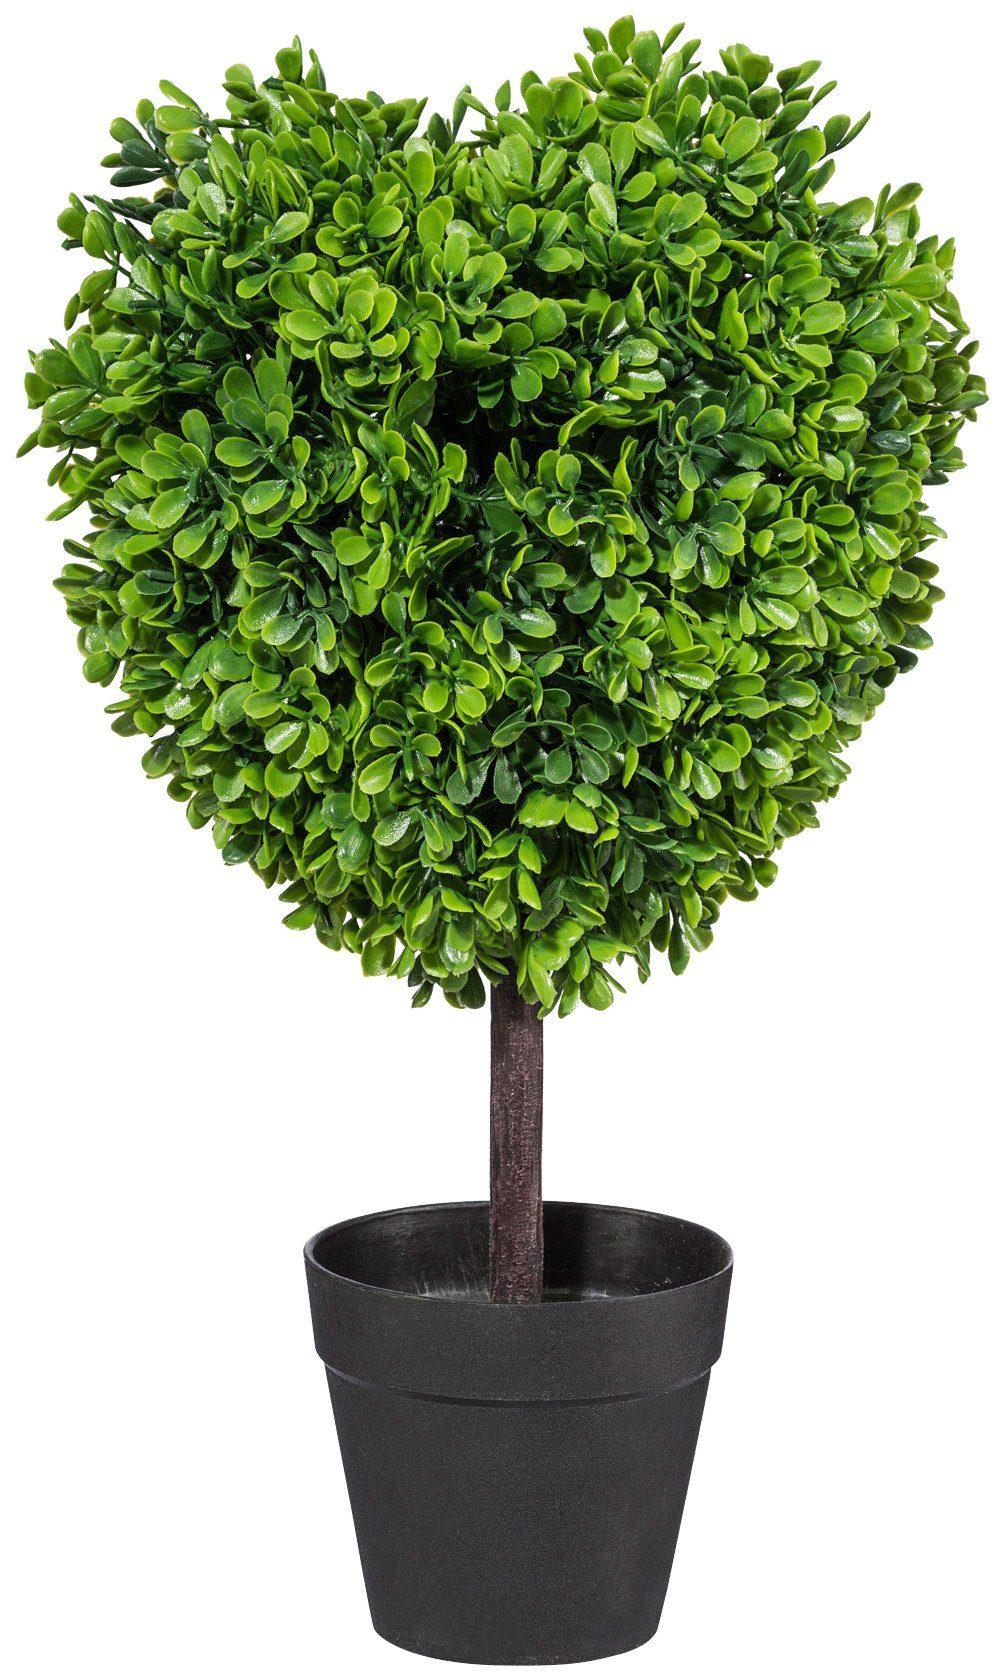 Kunstpflanze »Buchsbaumherz« inkl. Pflanzgefäß